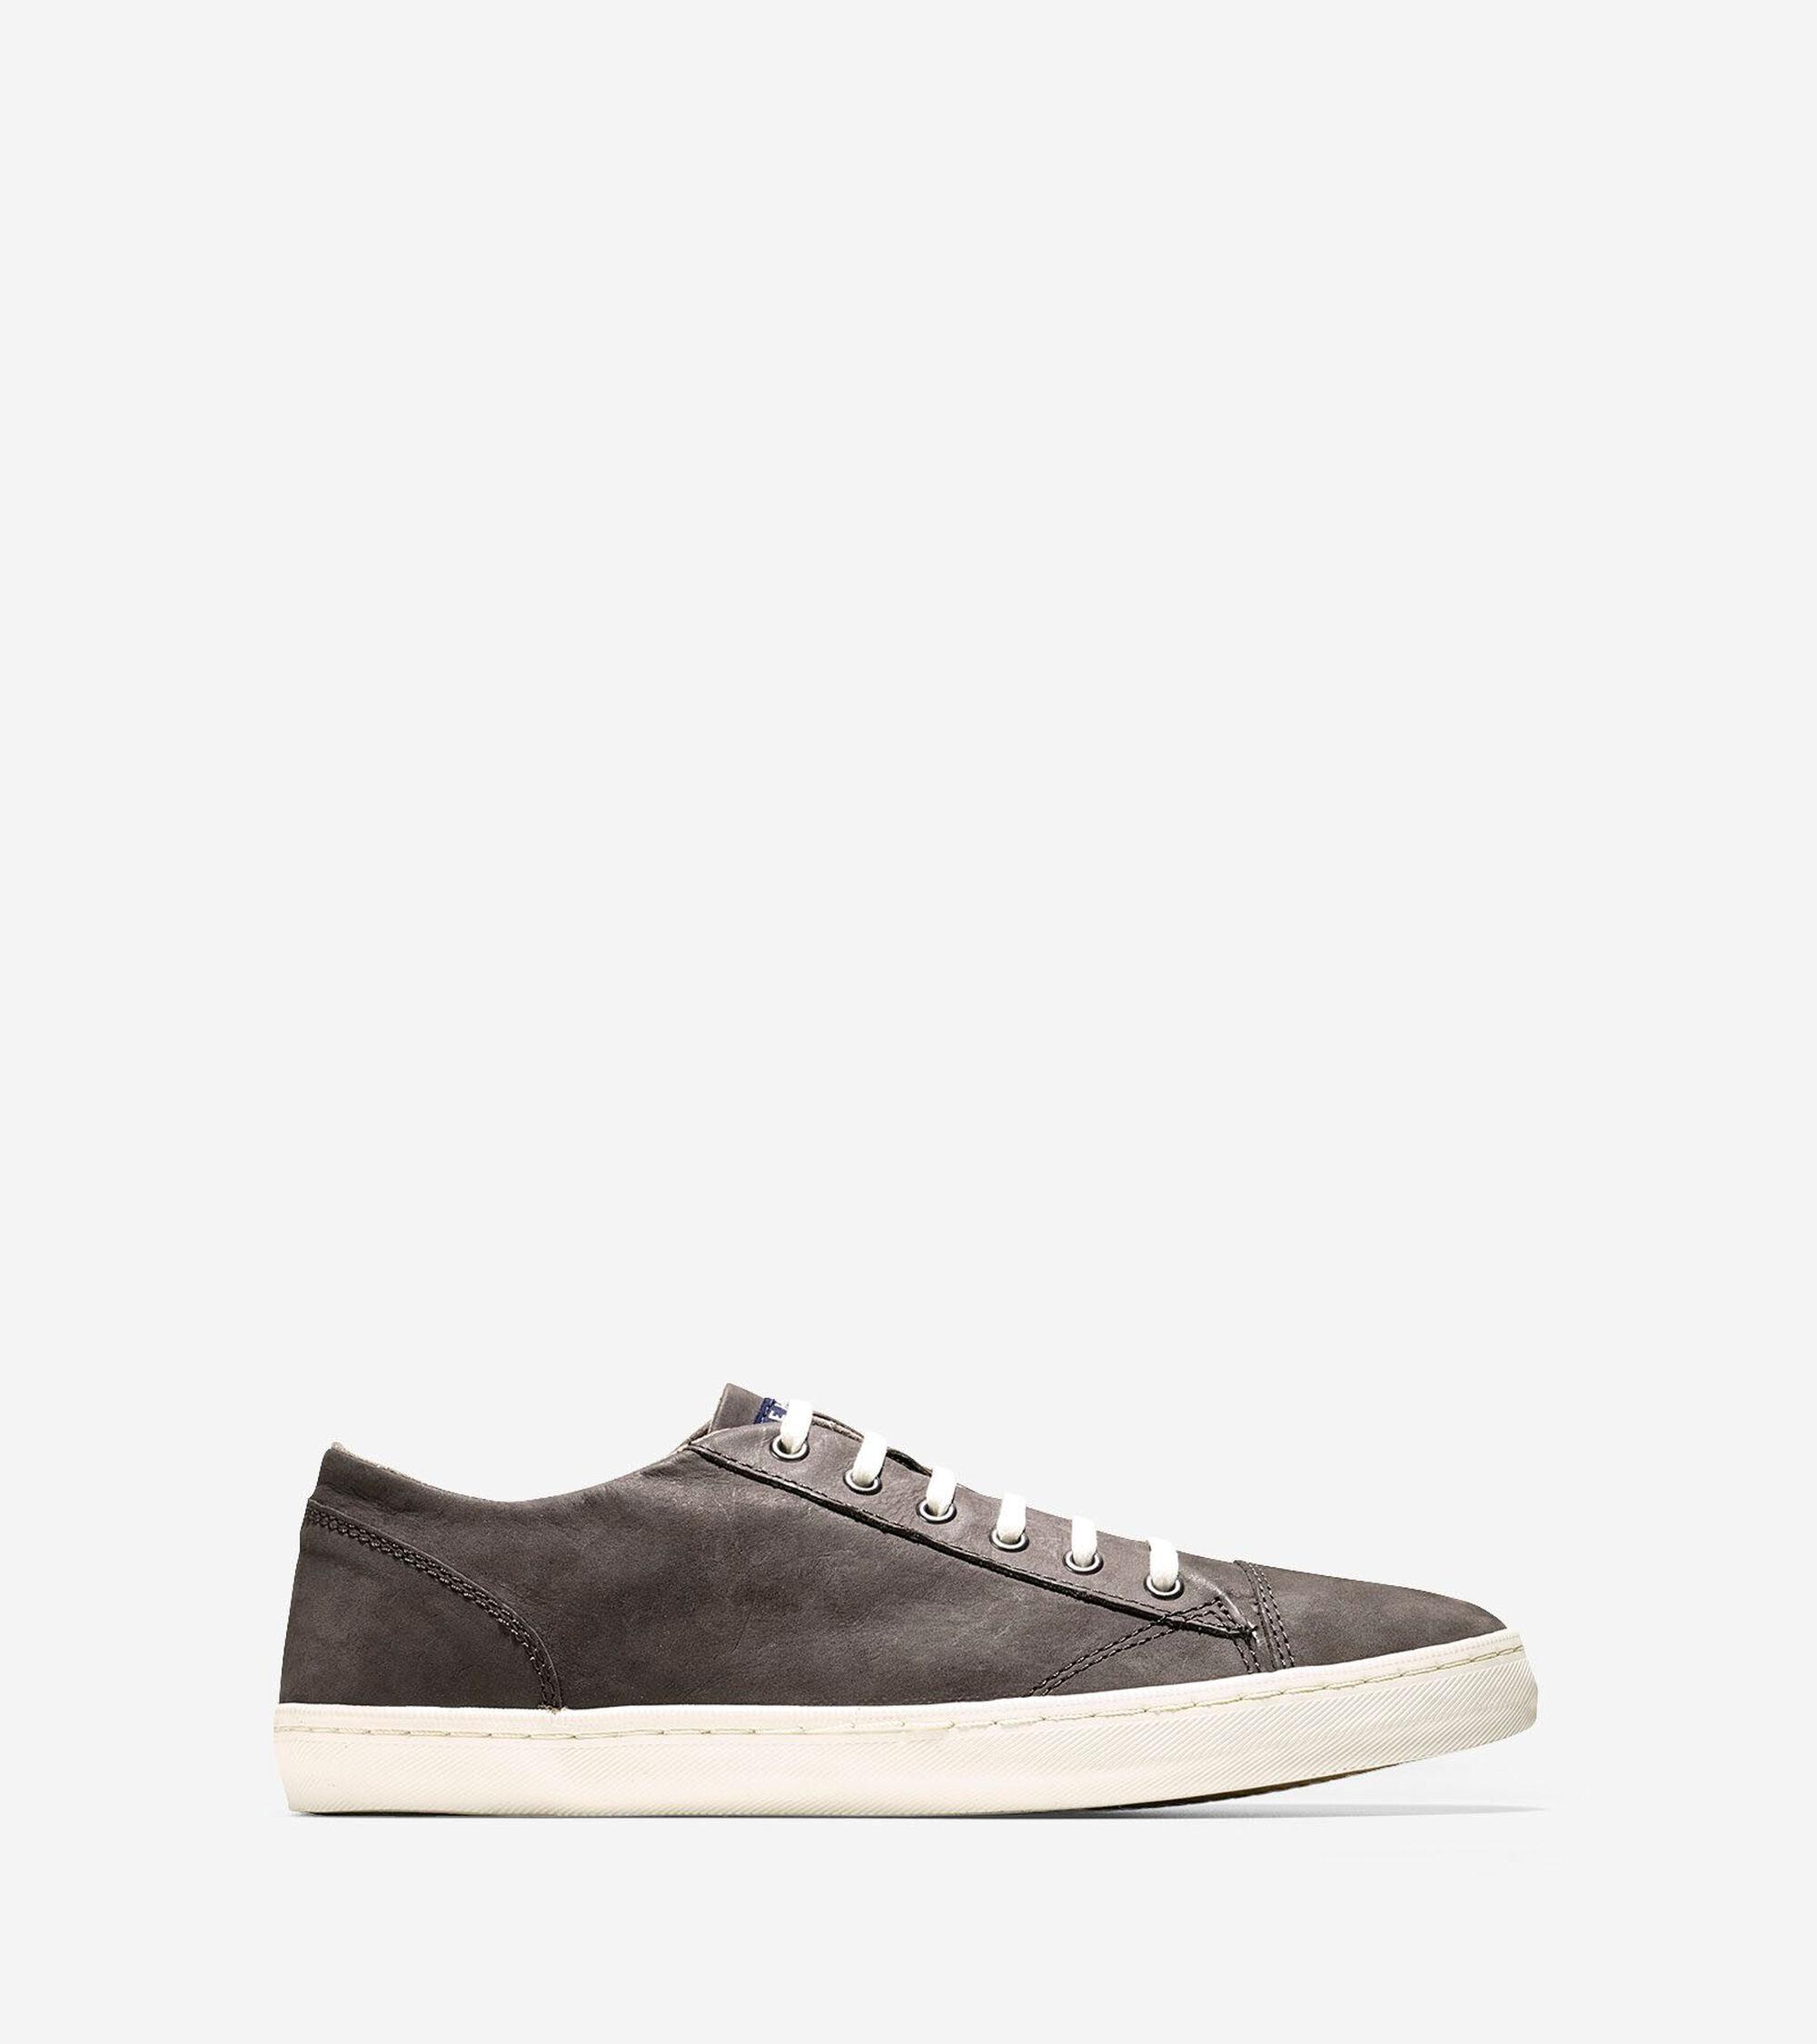 Sneakers > Trafton Luxe Cap Toe Oxford